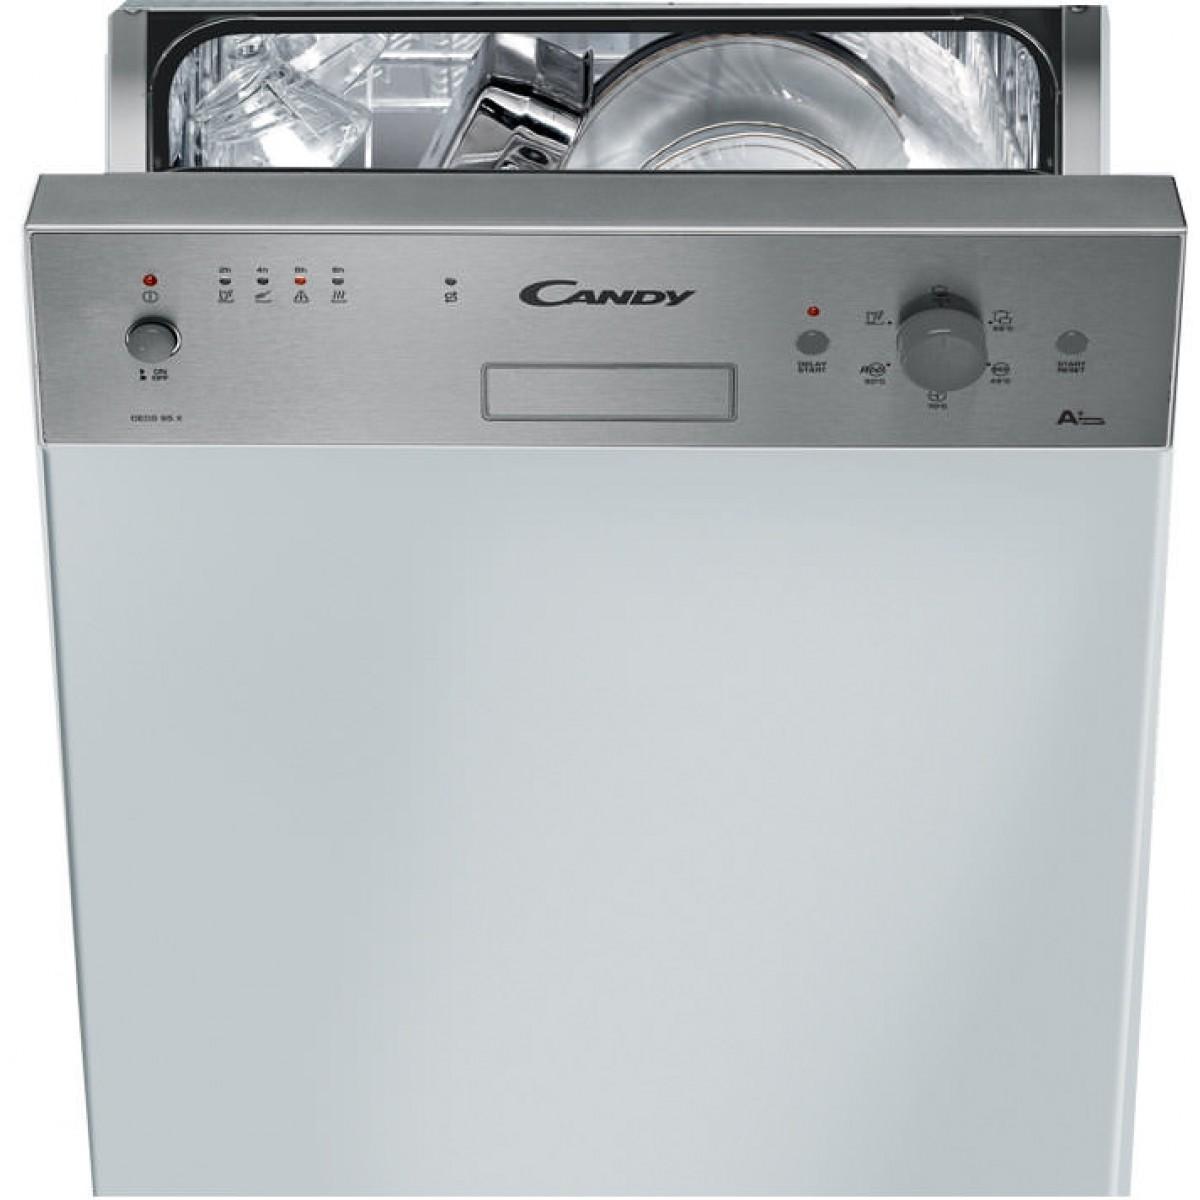 Candy CEDS 95X/E-S Πλυντήρια Ηλεκτρικες Συσκευες - homeelectrics.gr